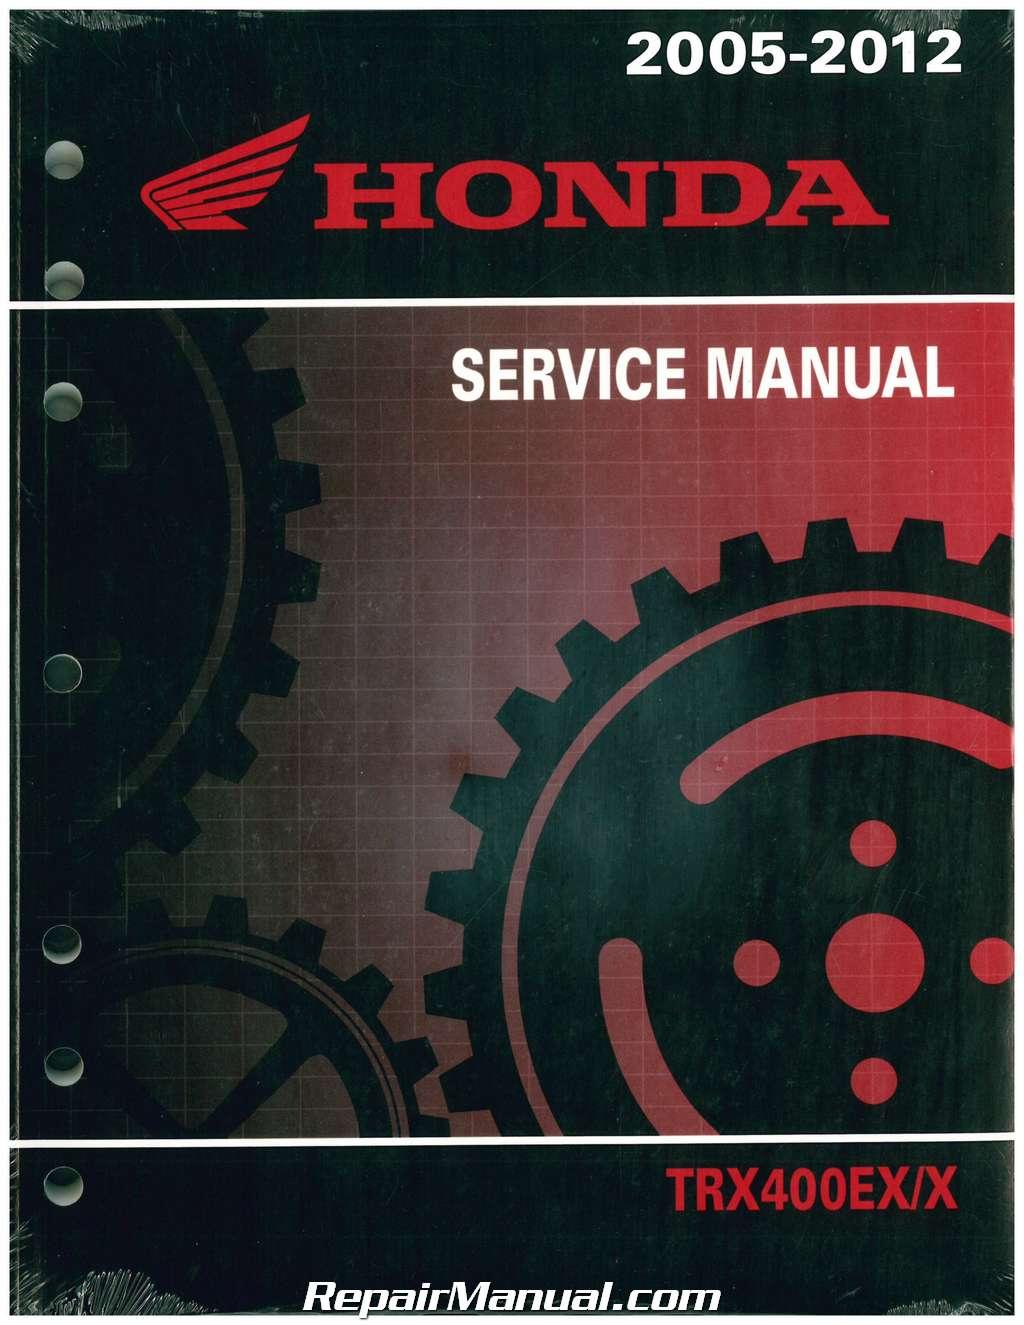 2005 2014 honda trx400ex x atv service manual rh repairmanual com Custom 2005 Honda TRX400EX 2005 honda 400ex service manual free download